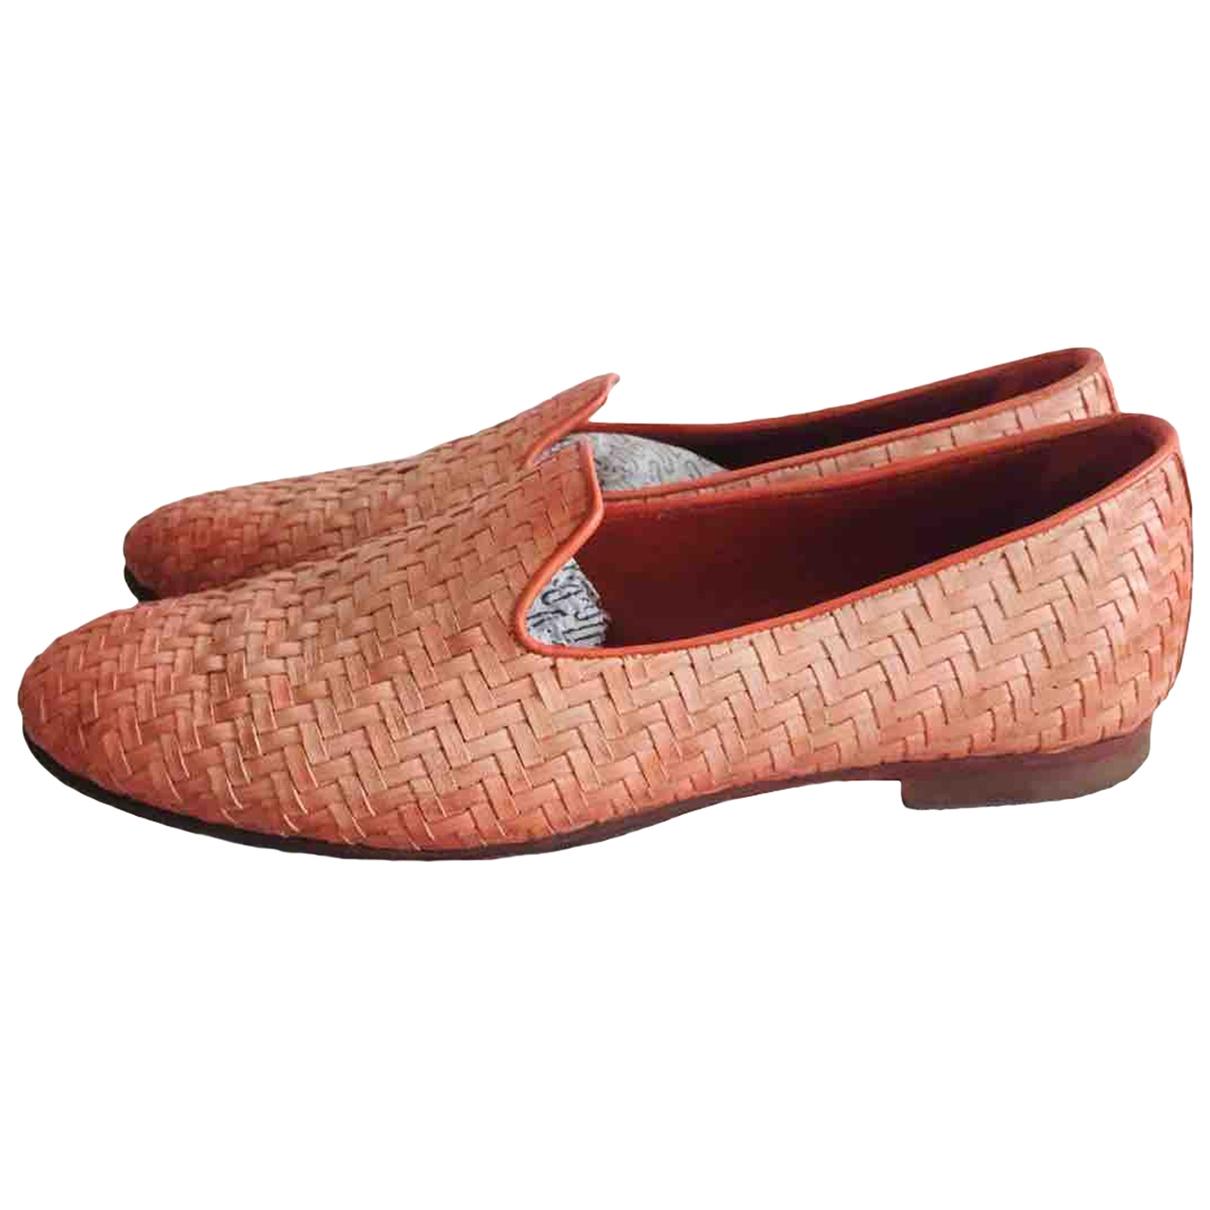 Santoni \N Orange Leather Flats for Women 38 IT